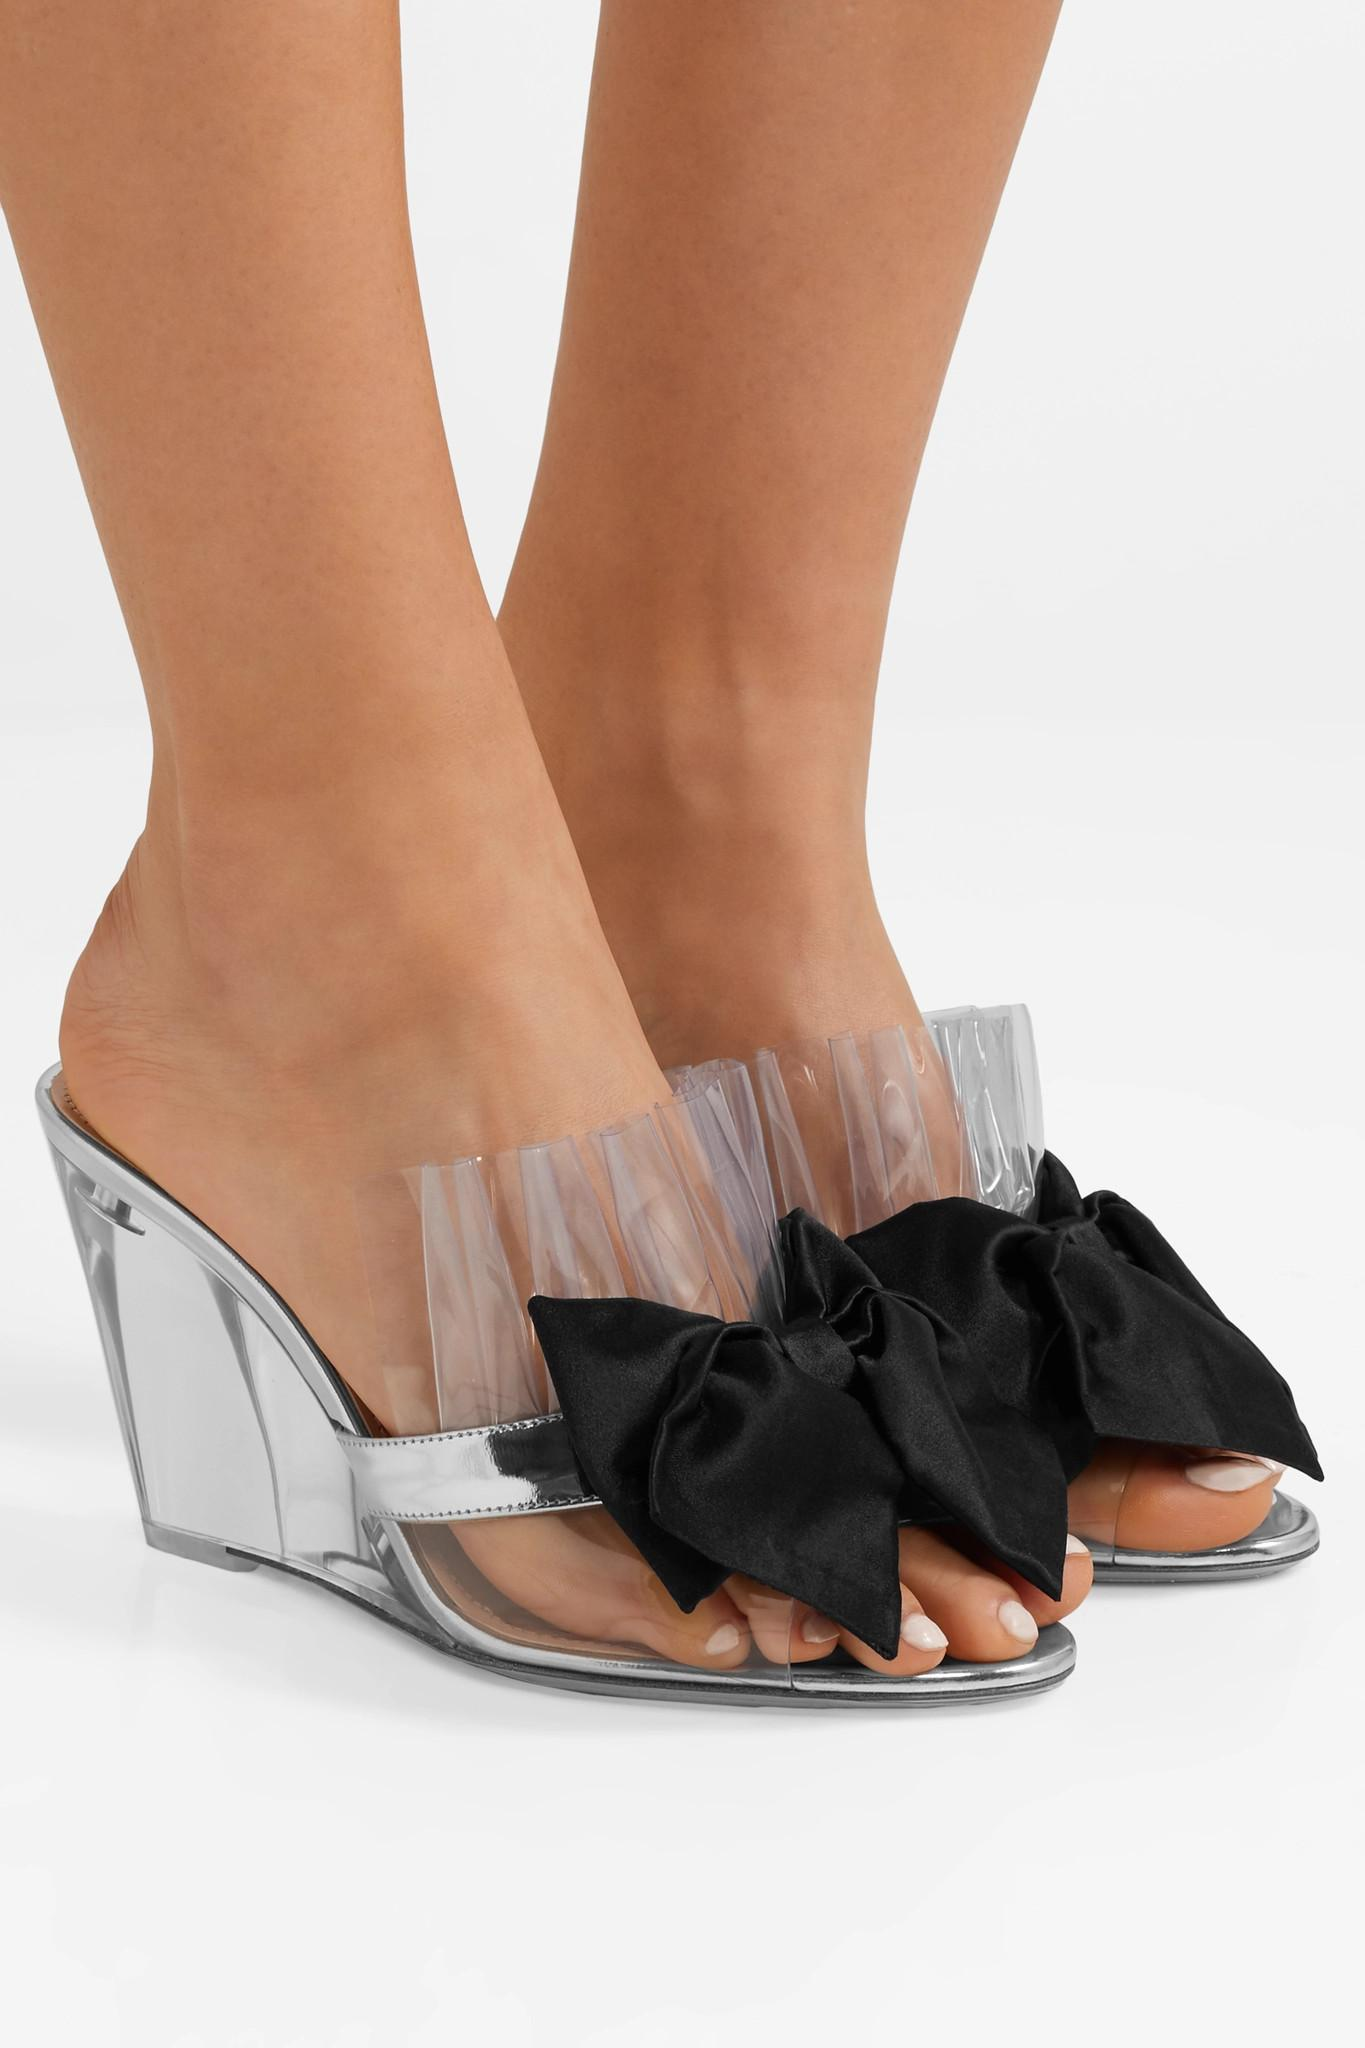 8bf665c6b8e Miu Miu - Bow-embellished Perspex And Metallic Leather Wedge Sandals -  Lyst. View fullscreen